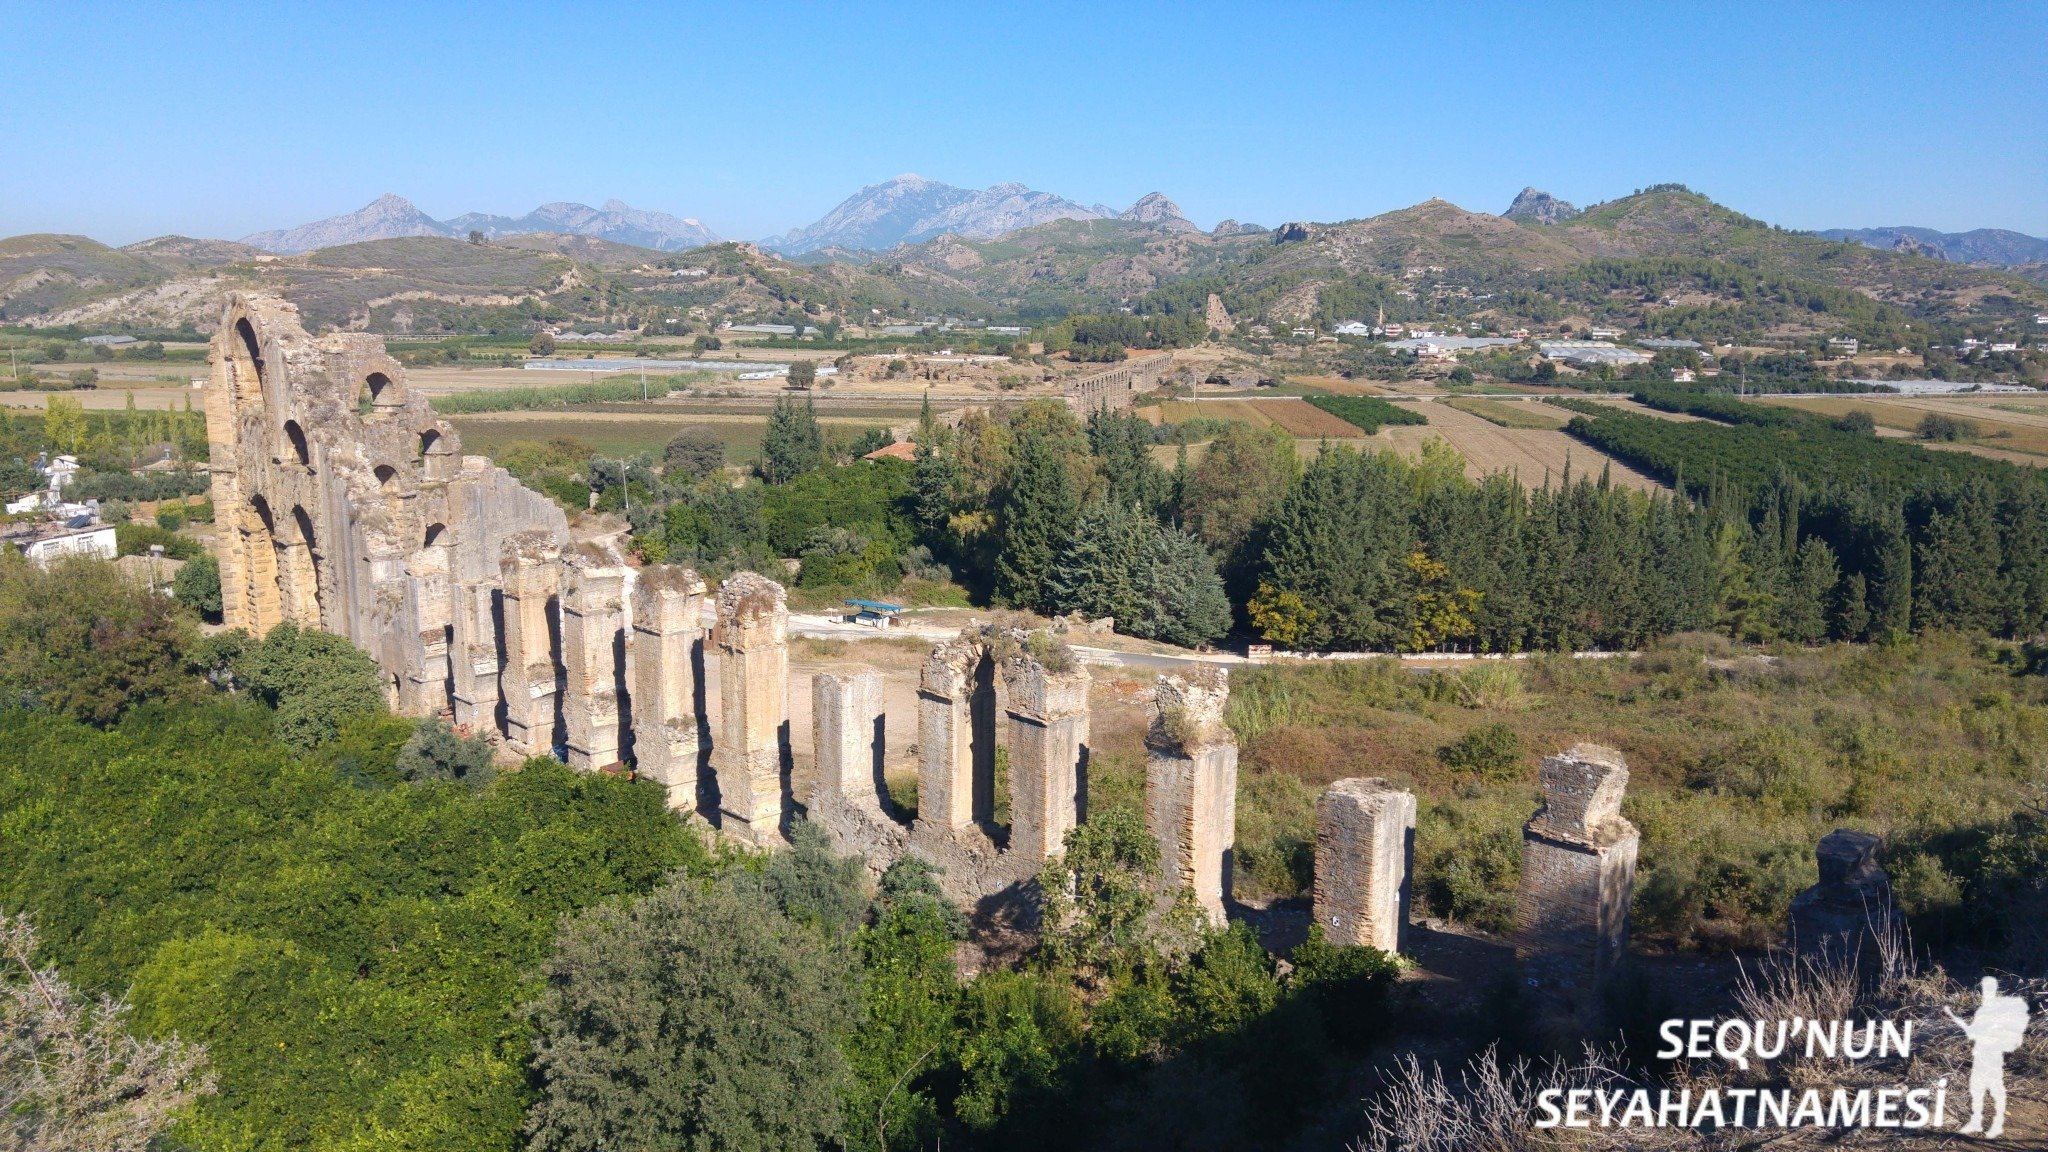 Aspendos Antik Kenti Tarihi : Aspendos antik kenti ve tiyatrosu rota senin